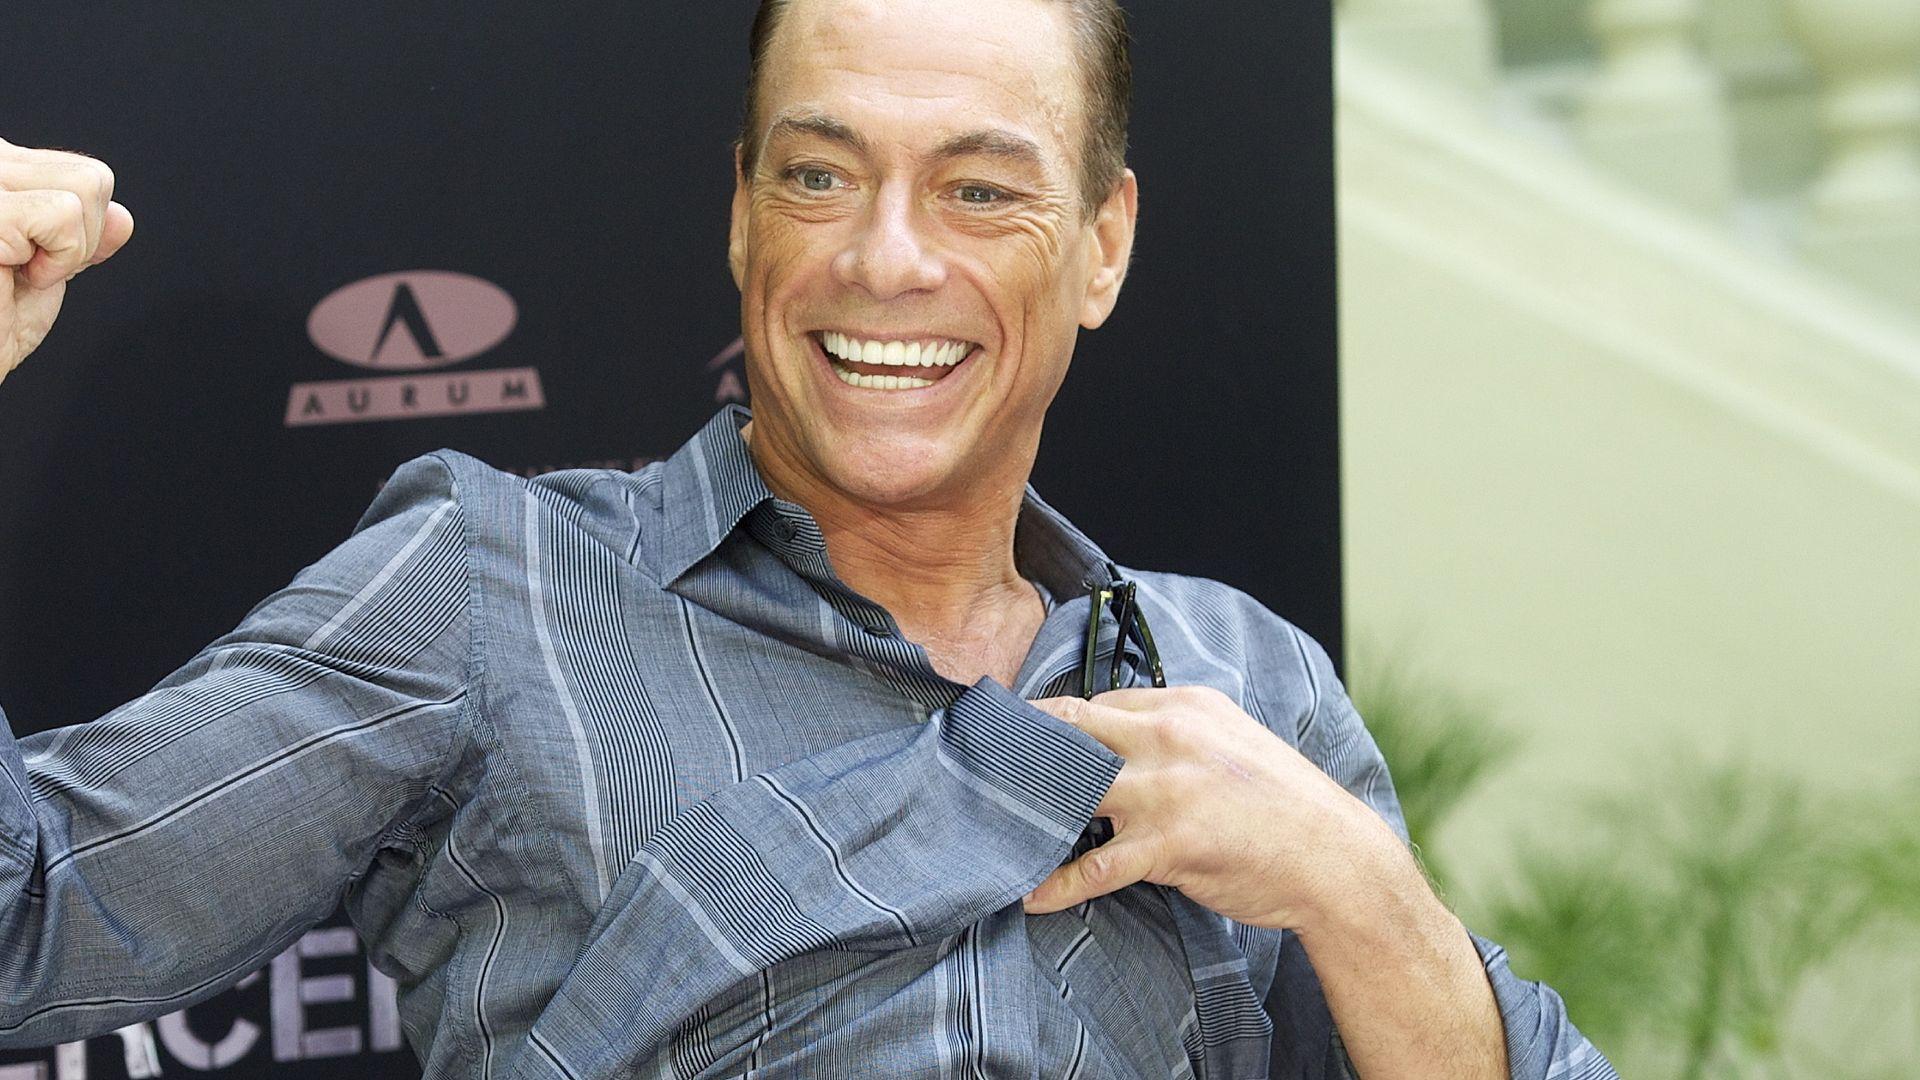 Jean Claude Van Damme Wallpapers Images Photos Pictures